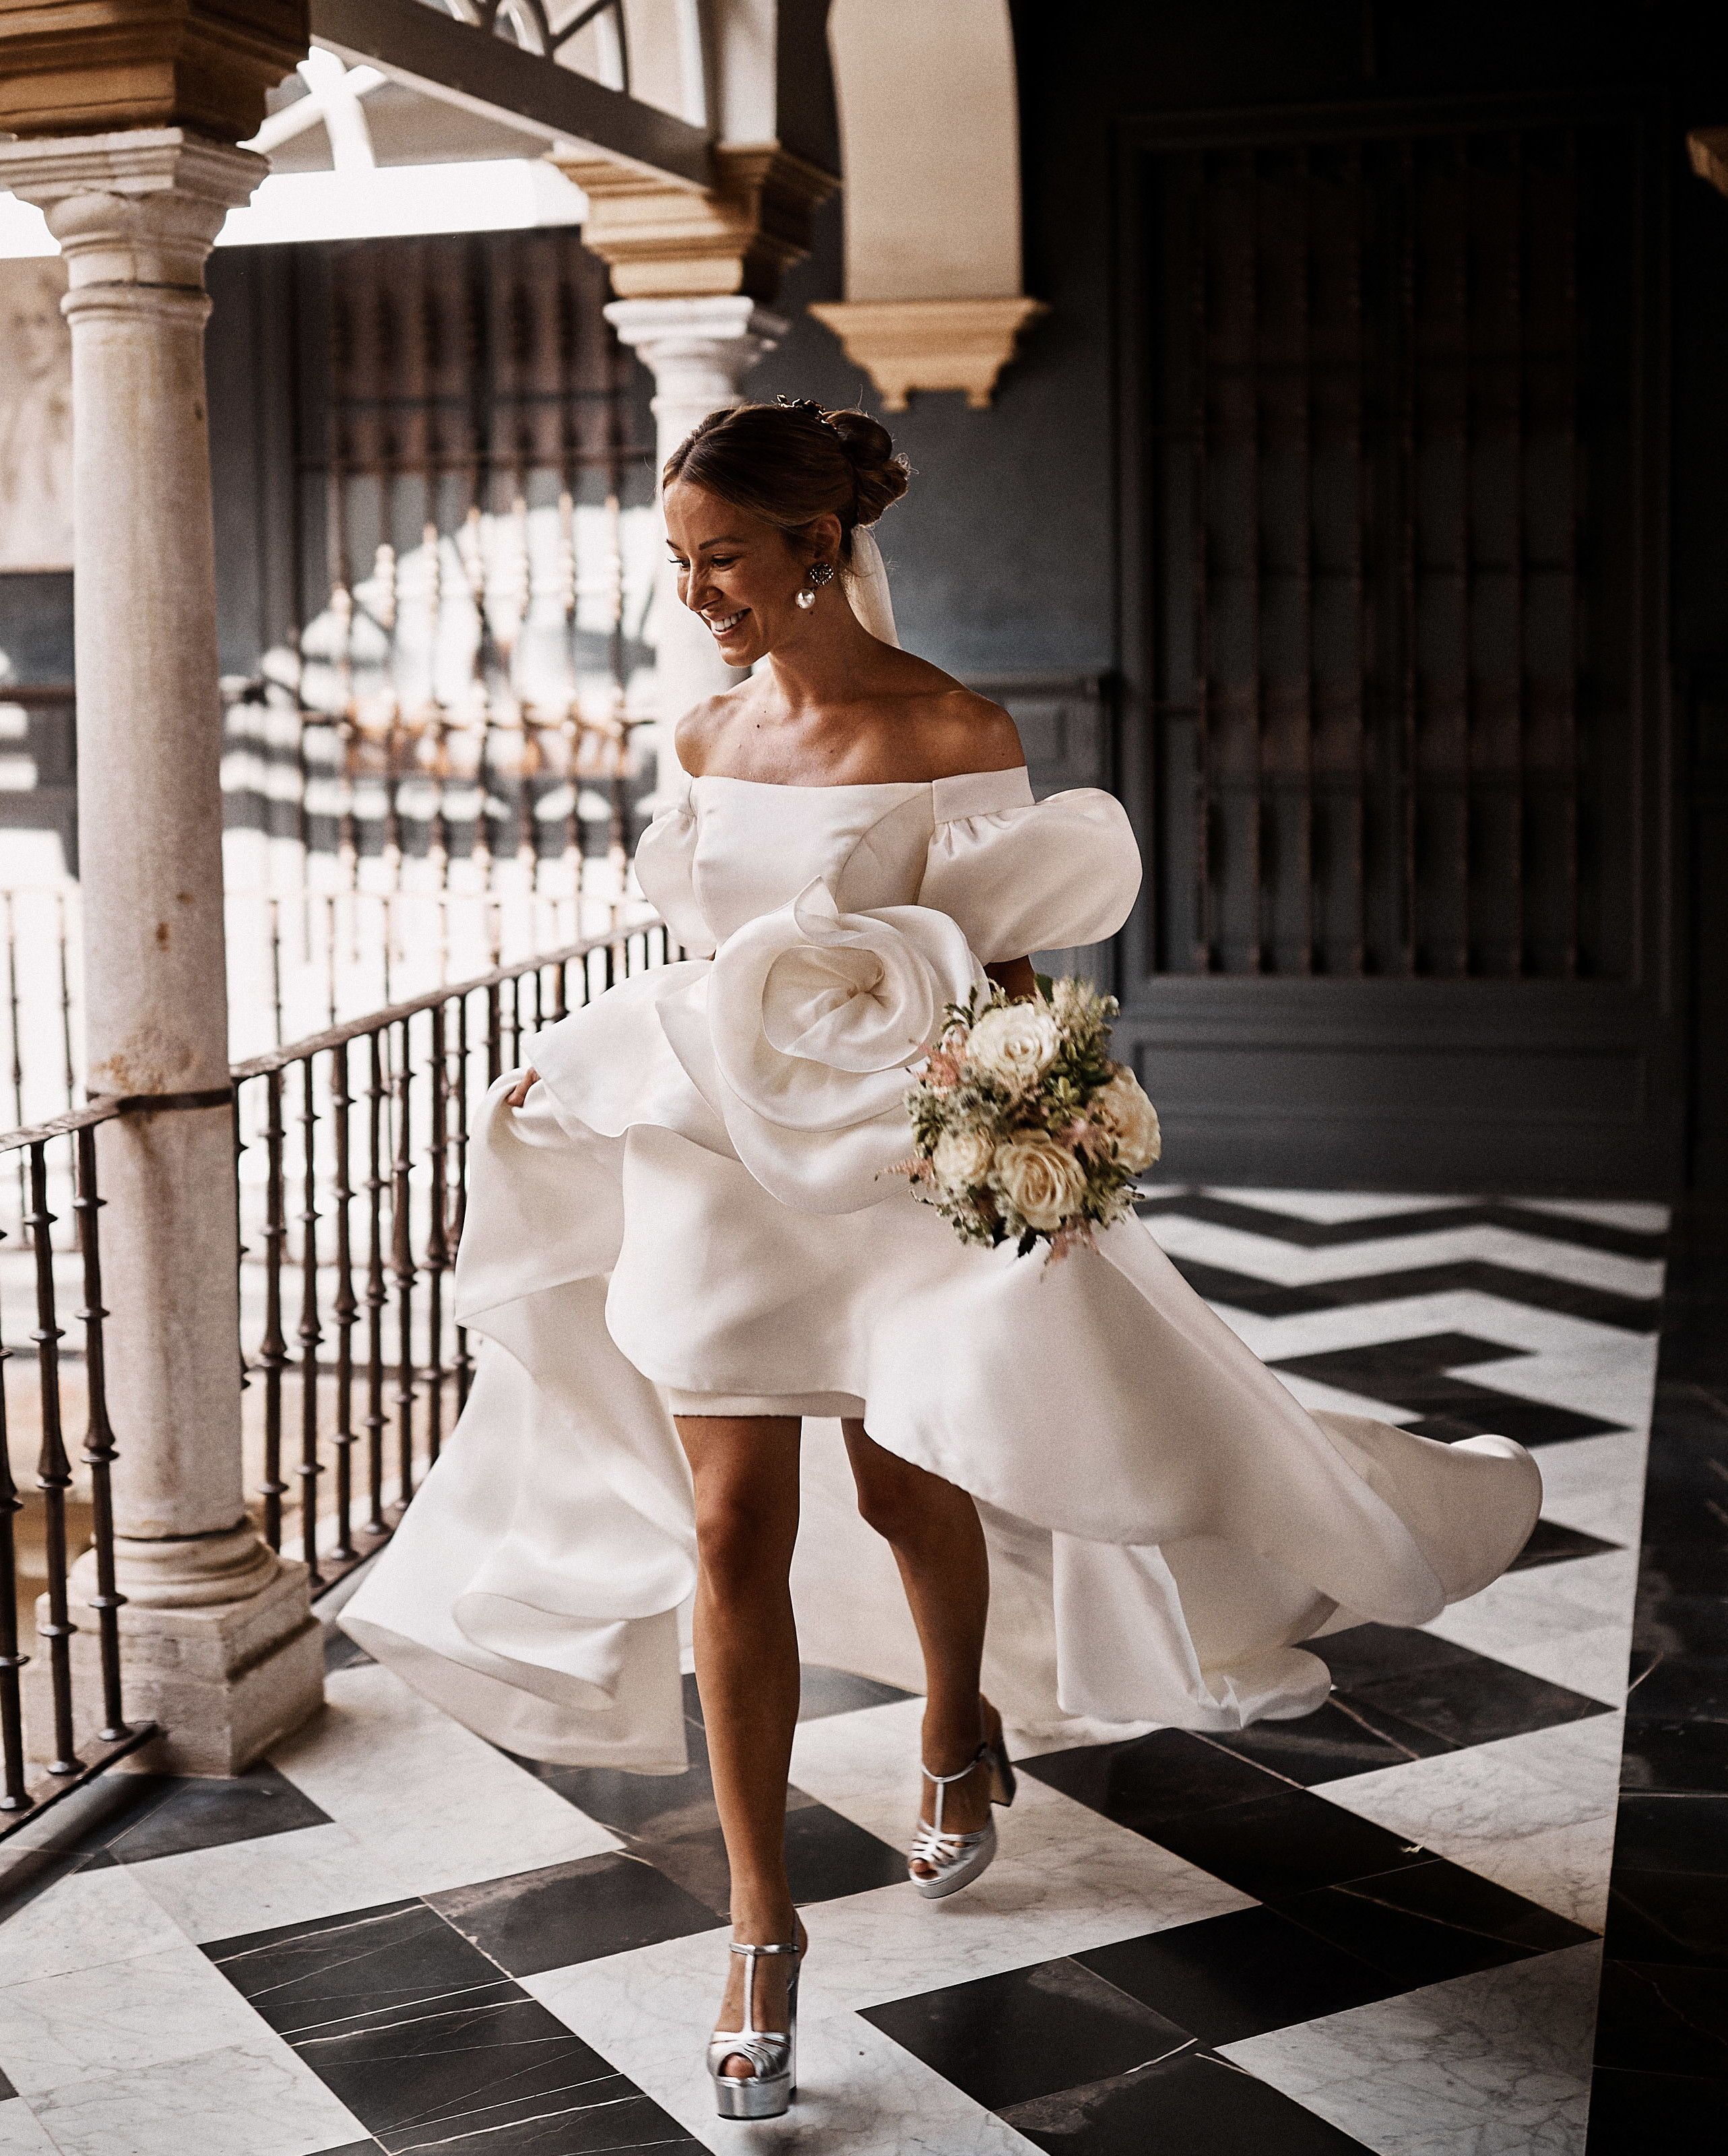 A High Fashion High Energy Wedding In Seville Spain Wedding Dress Styles Short Wedding Dress Wedding Gowns [ 3200 x 2565 Pixel ]